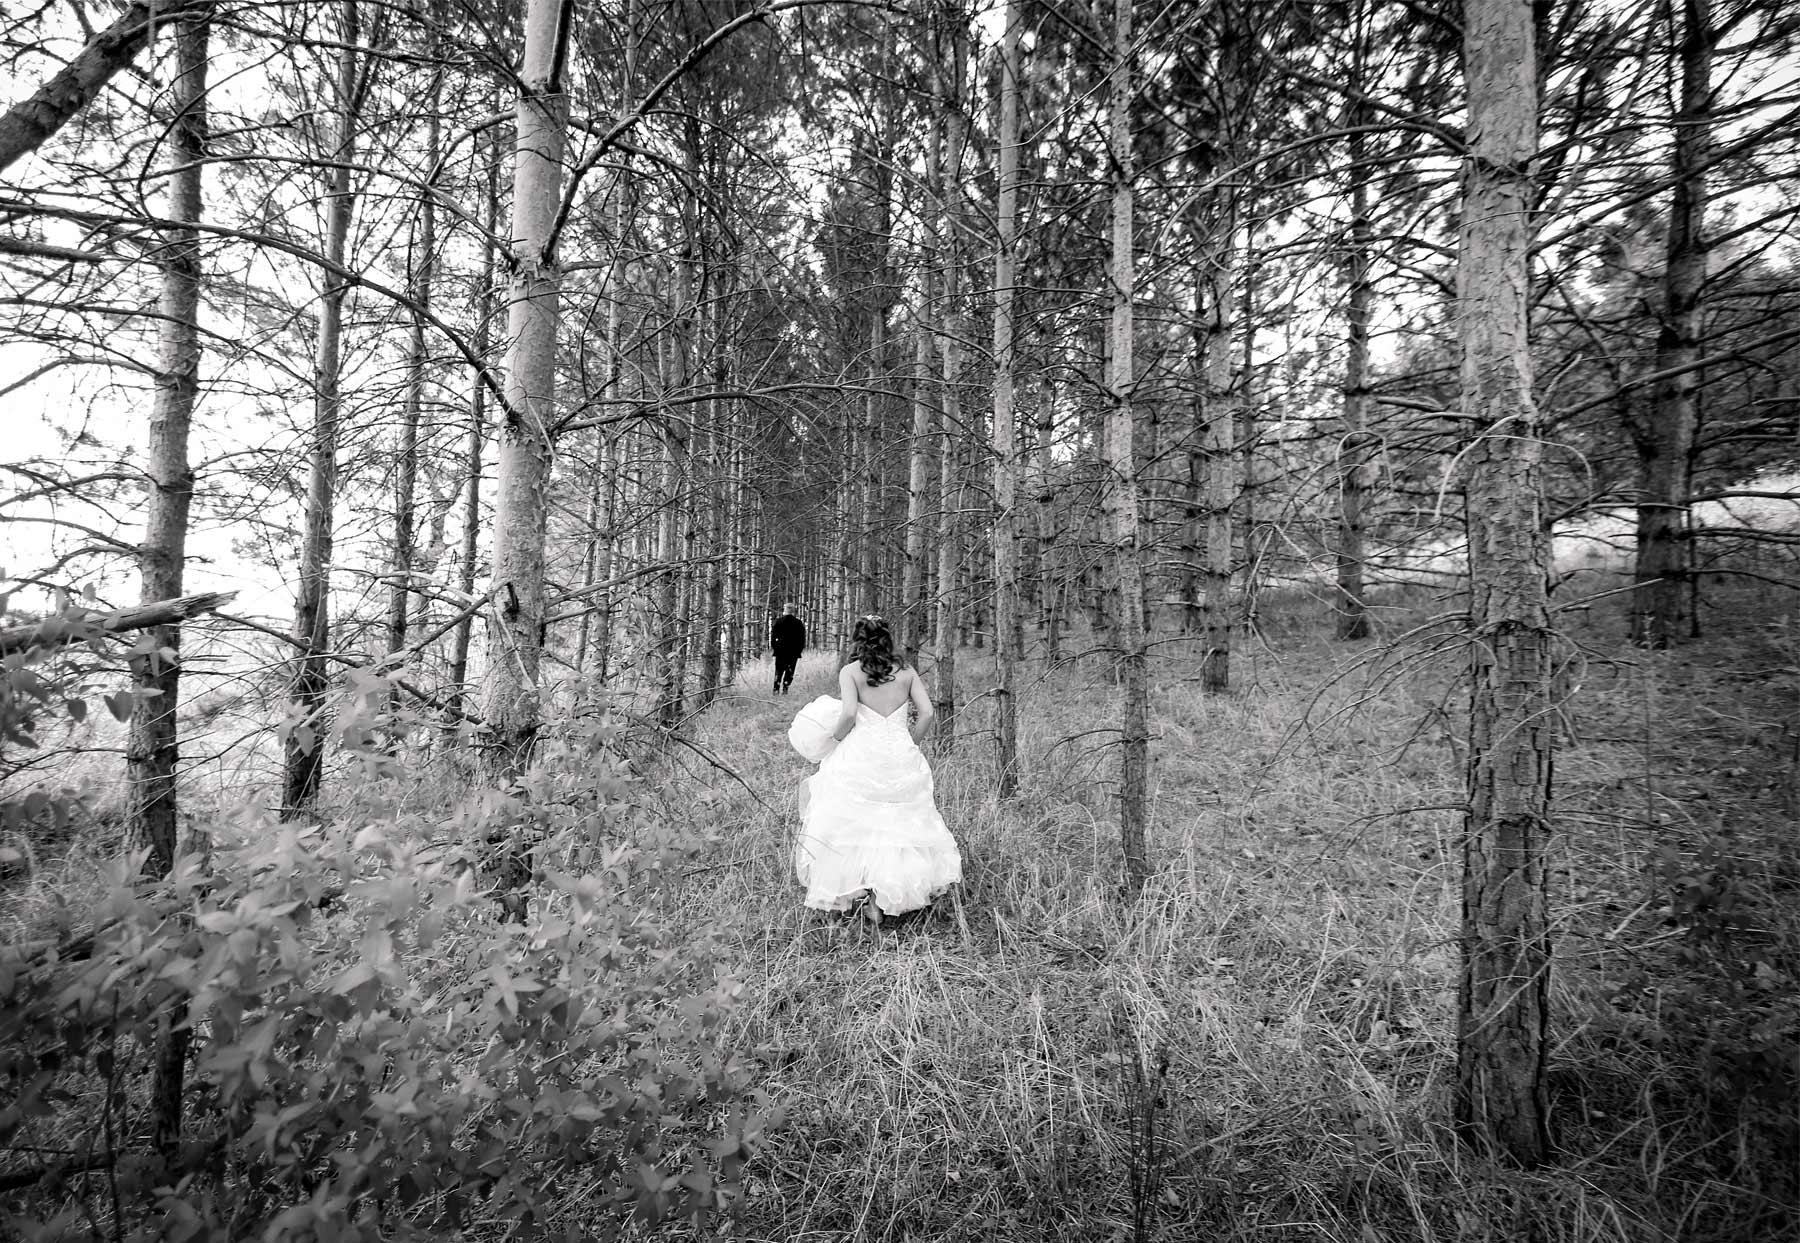 02-Minneapolis-Minnesota-Wedding-Photography-by-Vick-Photography-First-Look-Tianna-&-Matt.jpg